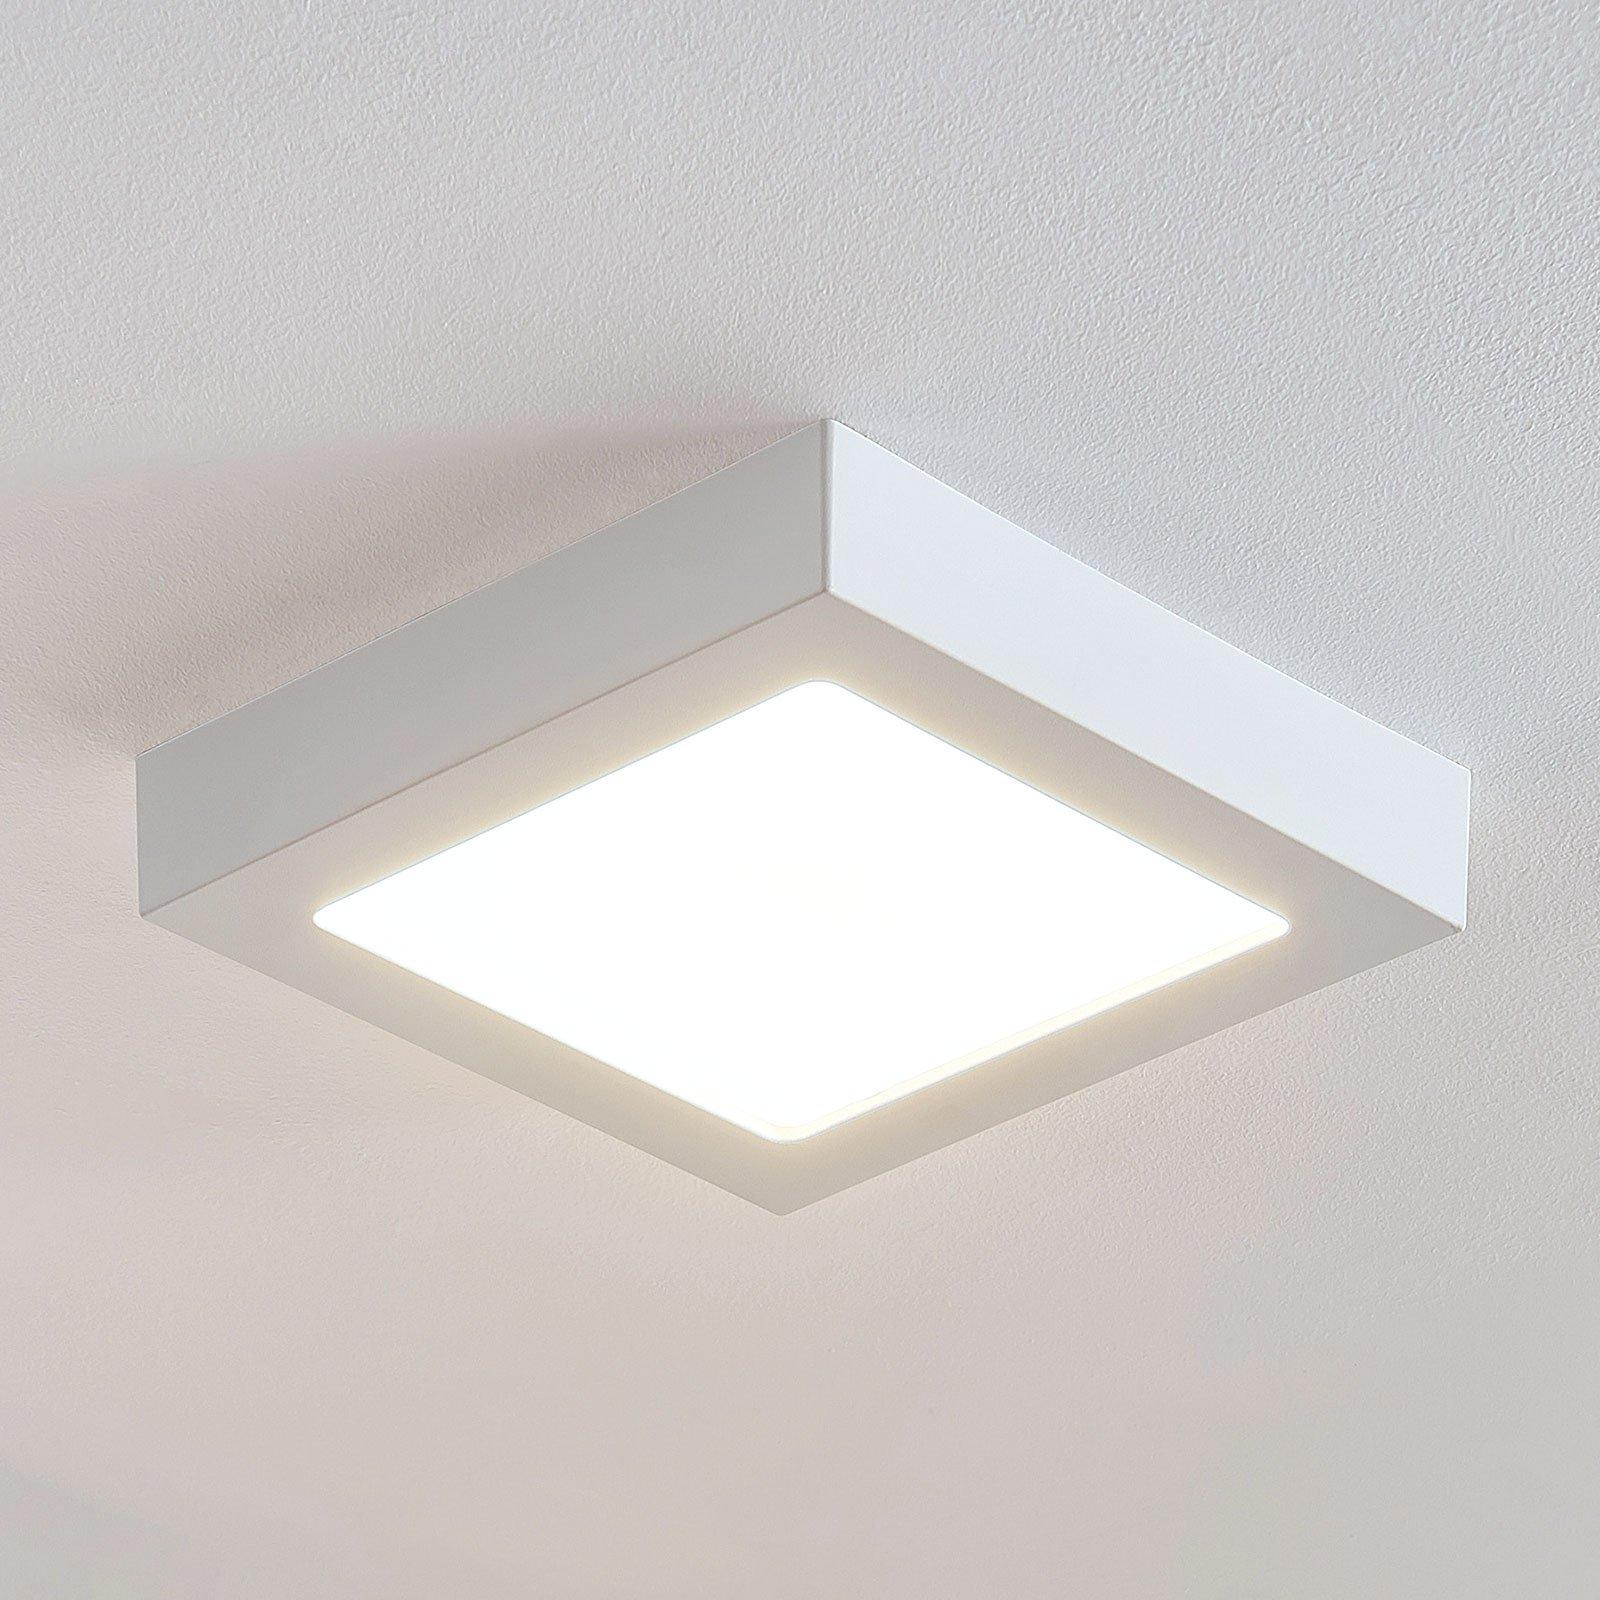 LED-taklampe Marlo, hvit, 3 000 K kantet 23,1 cm